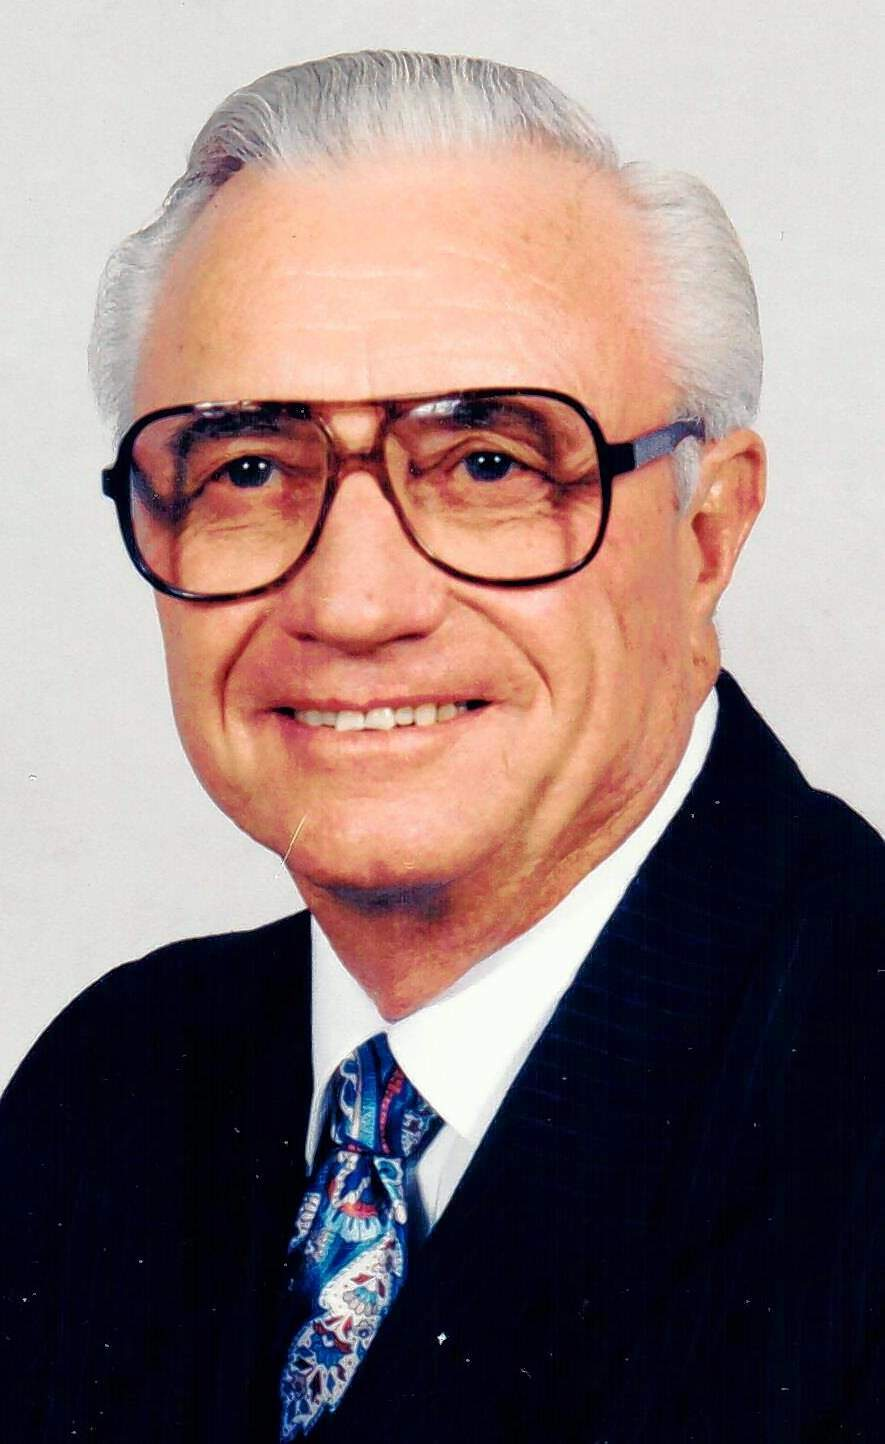 Willard E. Rodgers